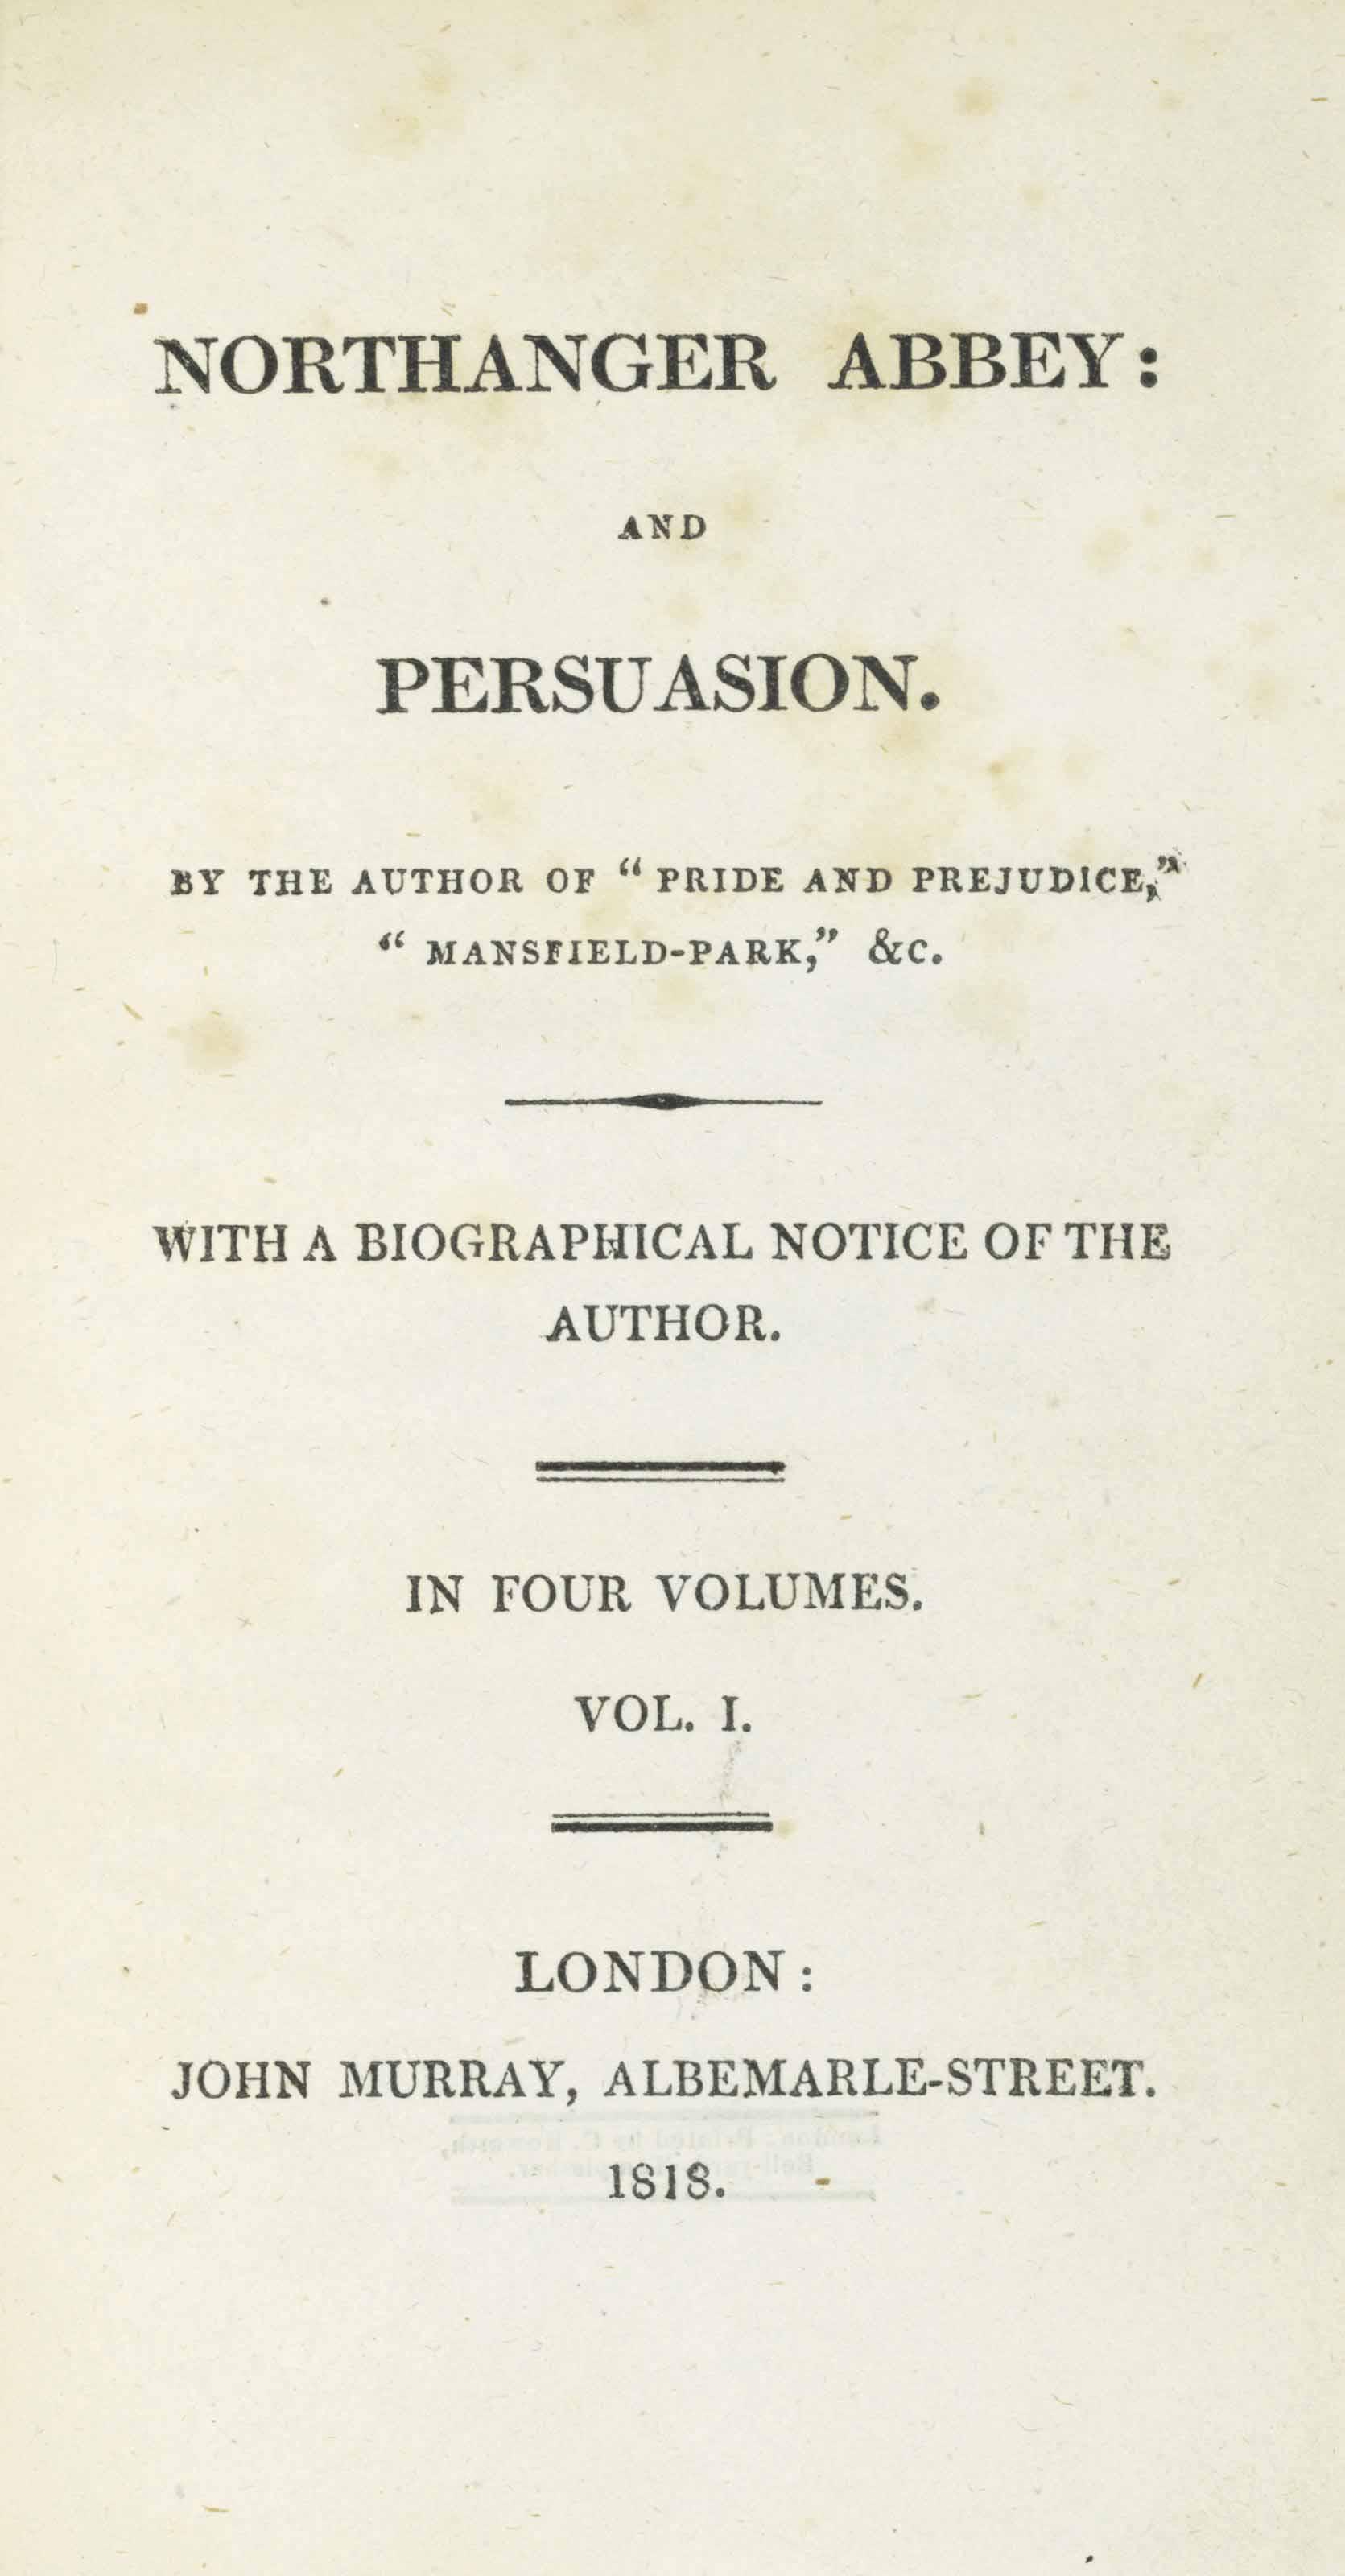 [AUSTEN, Jane]. Northanger Abbey and Persuasion. London: John Murray, 1818.